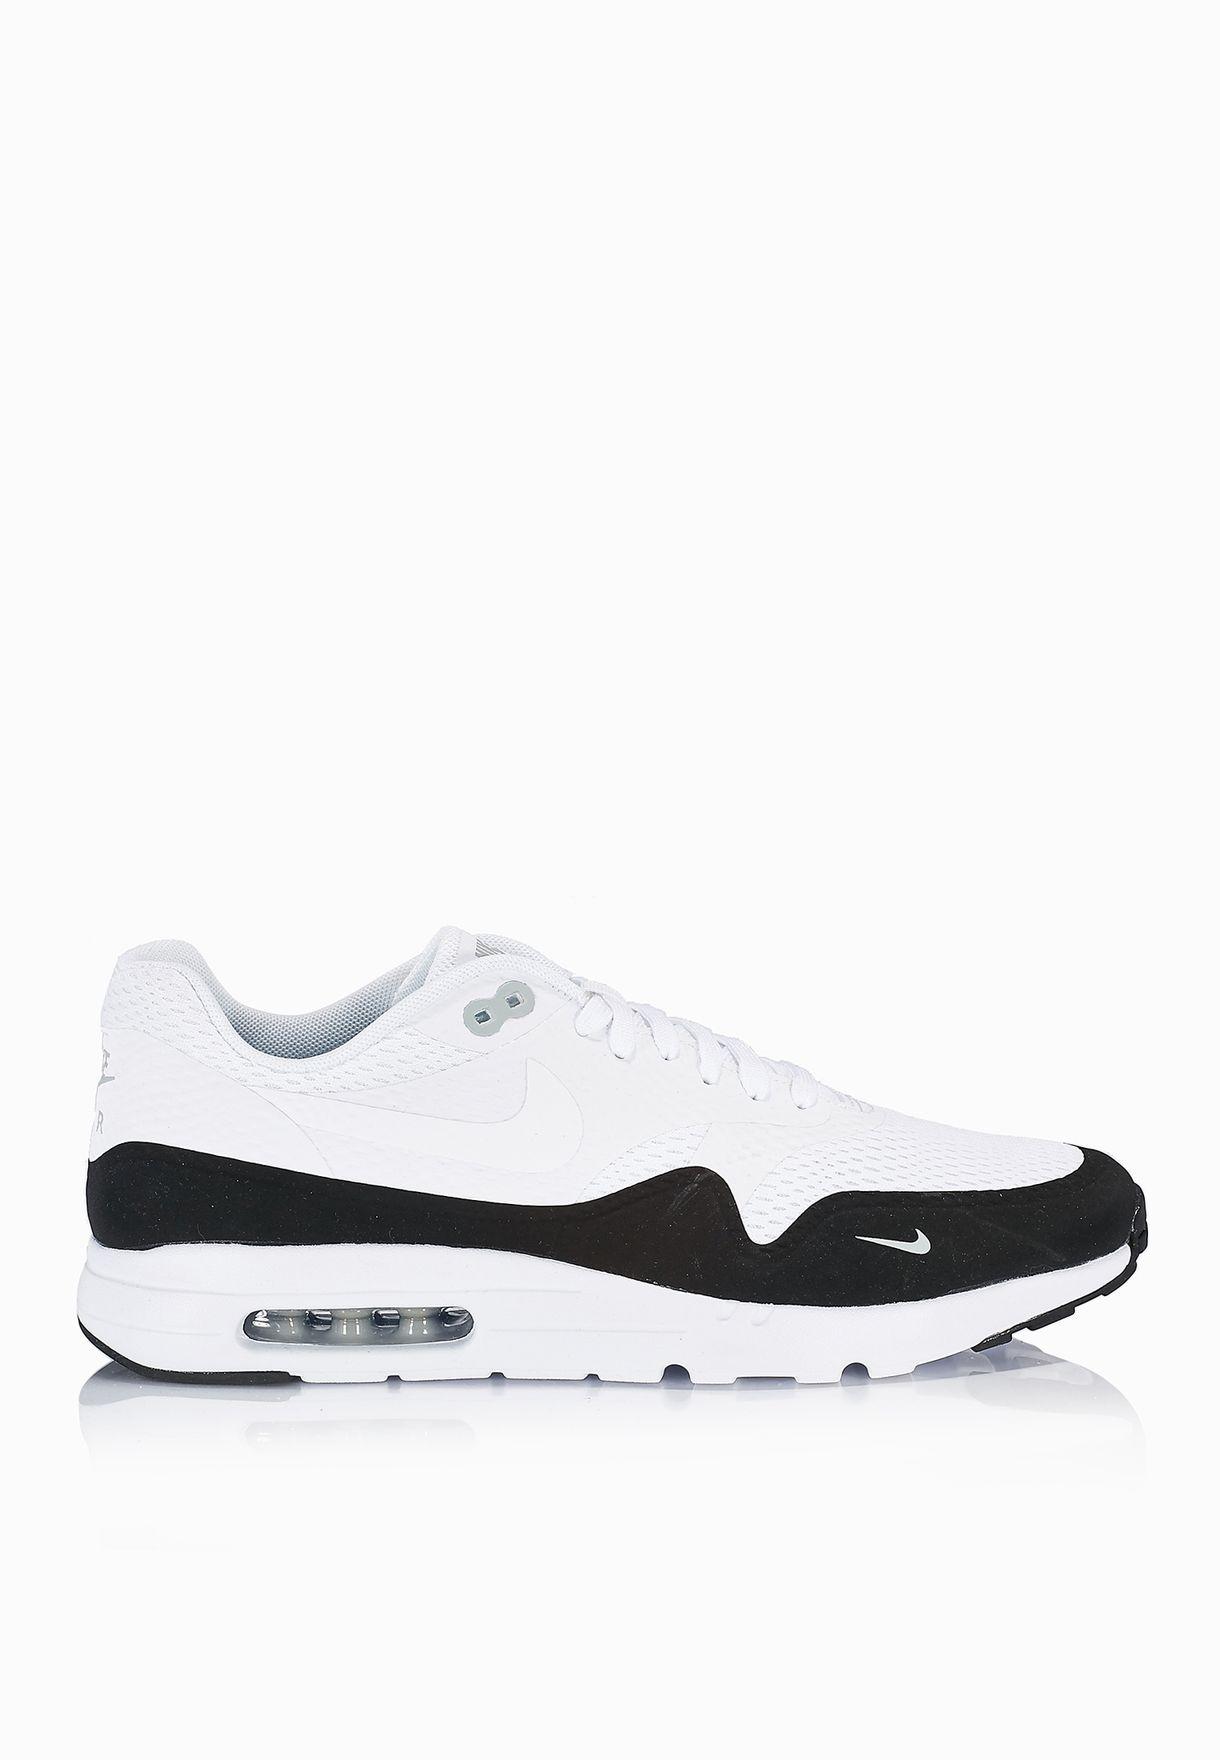 a26f2f9bce5e2 Shop Nike white Air Max 1 Ultra Essential 819476-101 for Men in ...